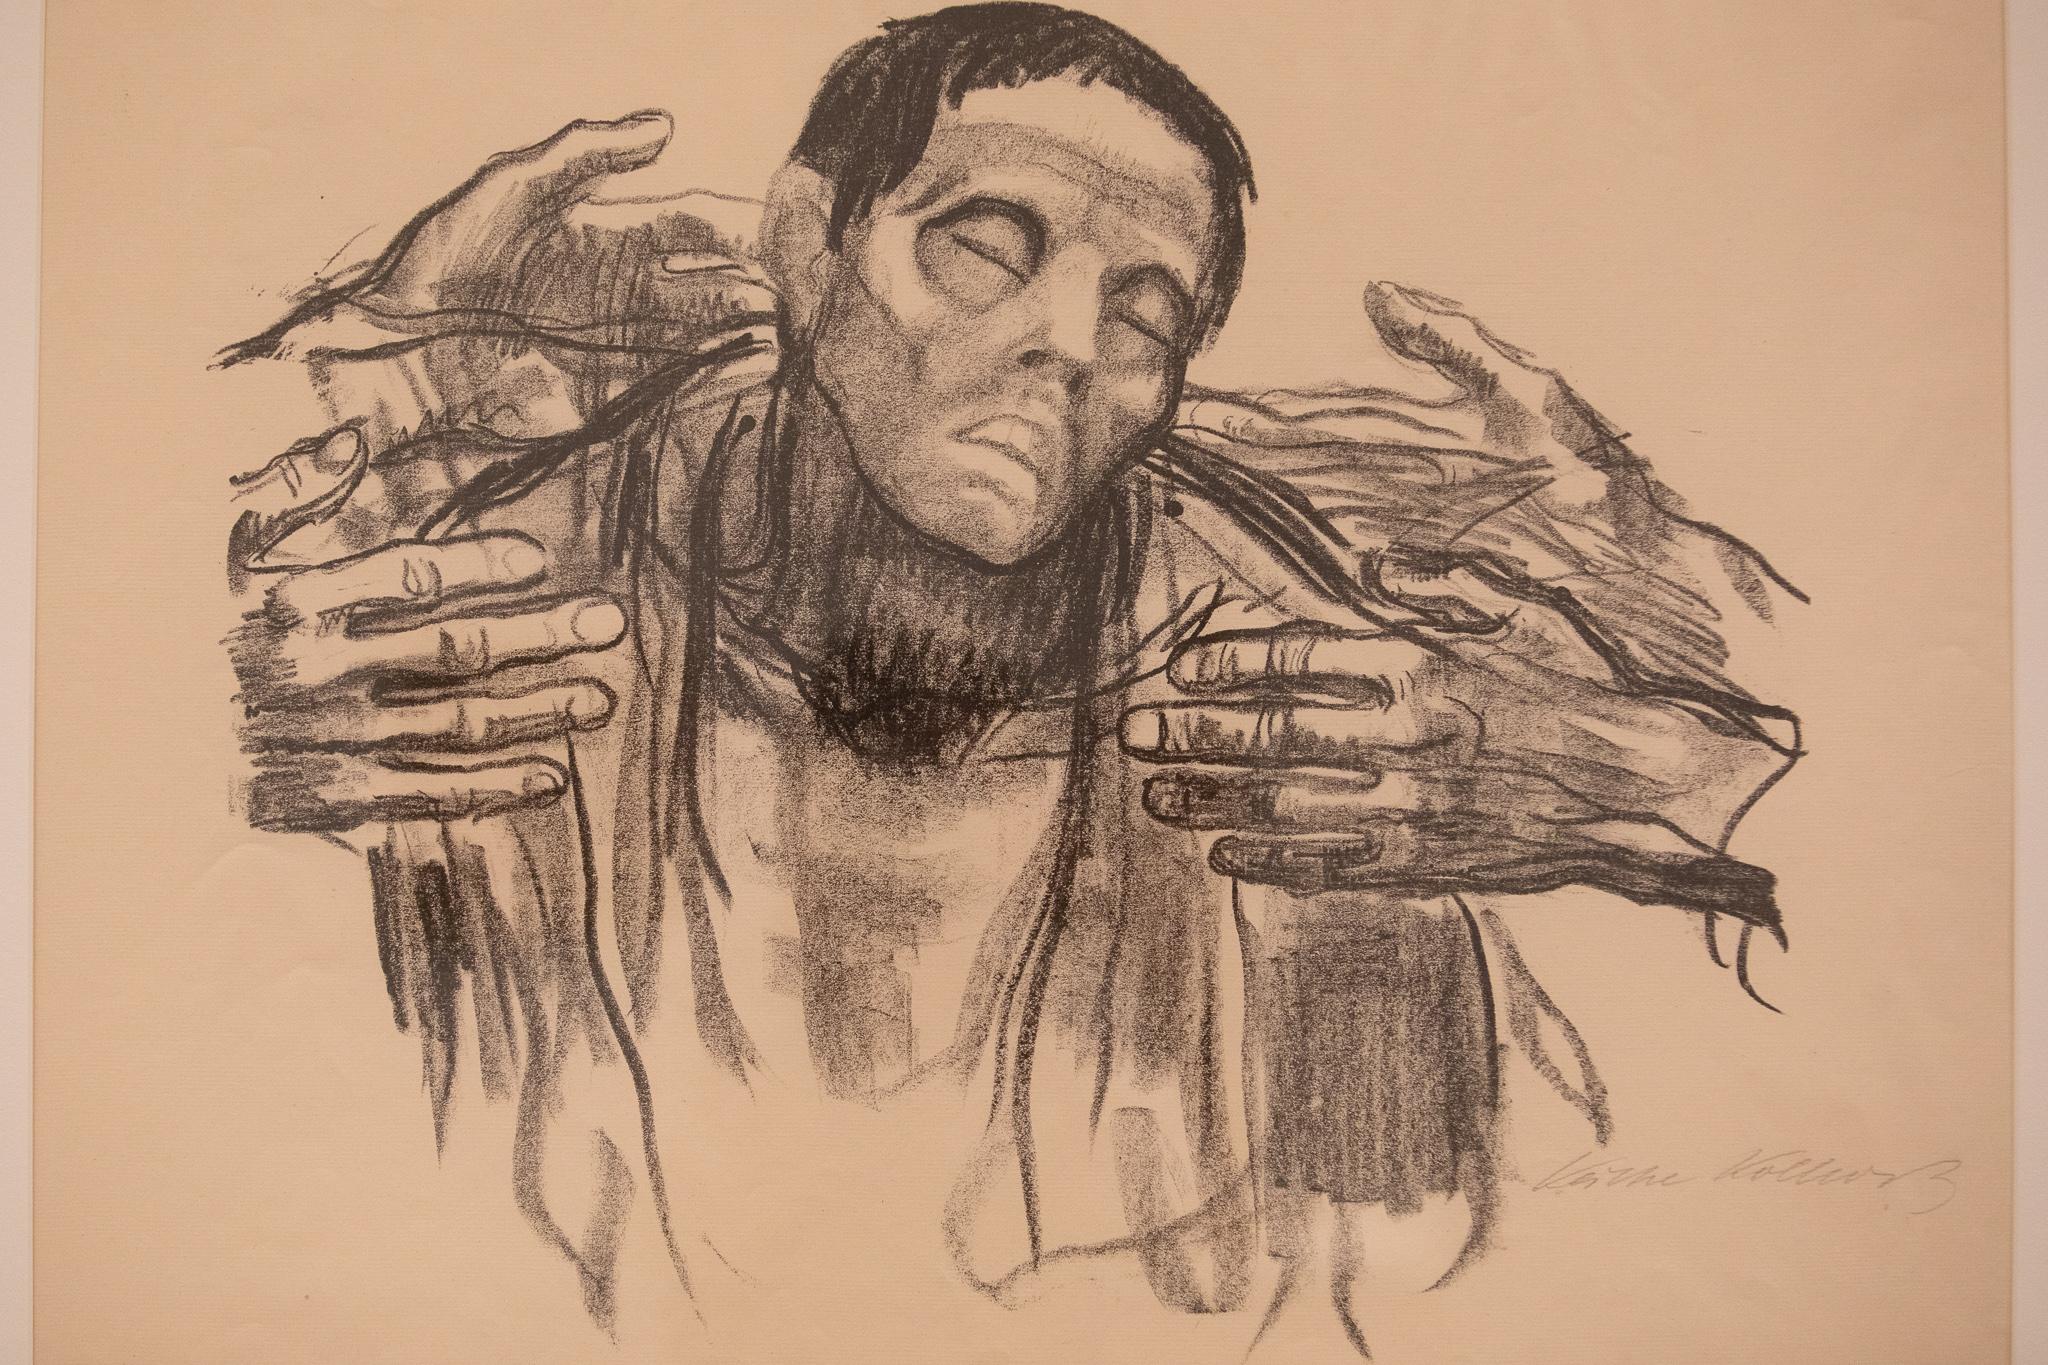 U2A3827 - Sheldon art exhibition shows waste drives human life